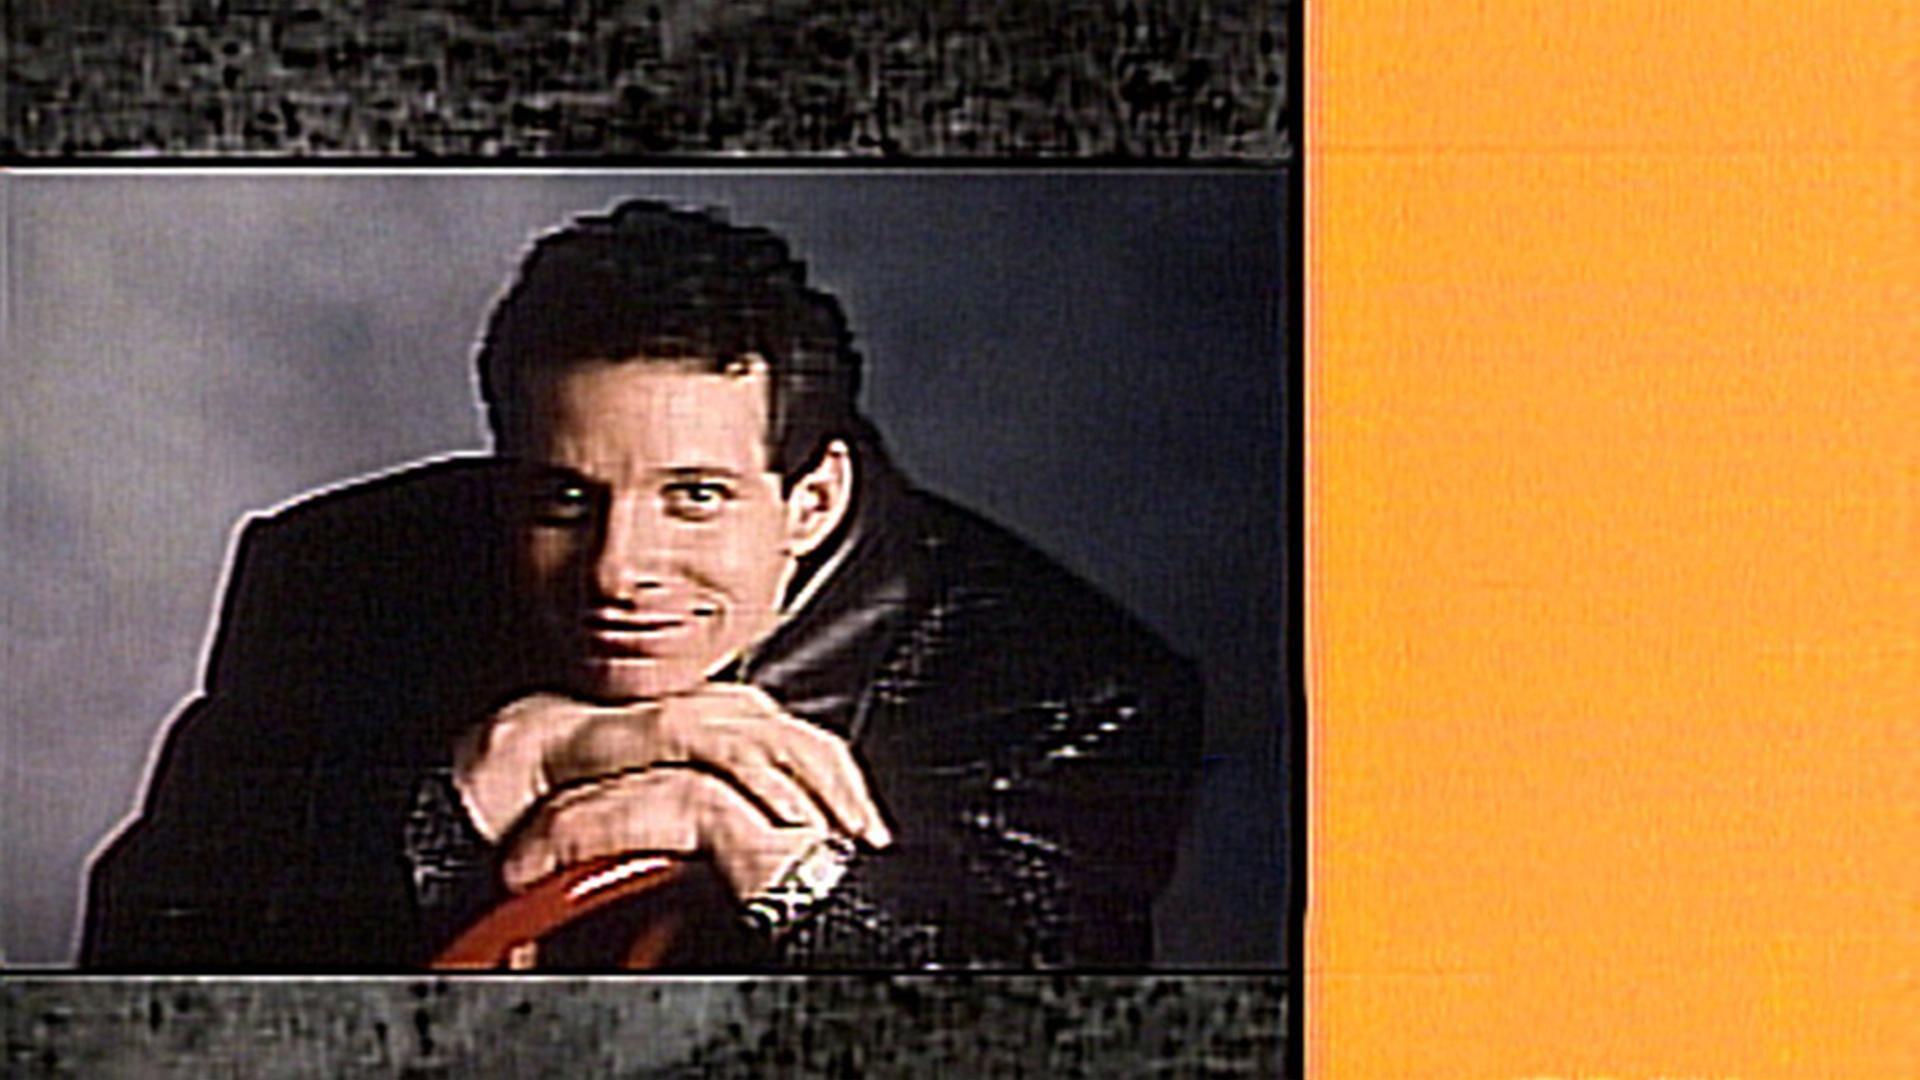 Steve Guttenberg: December 13, 1986